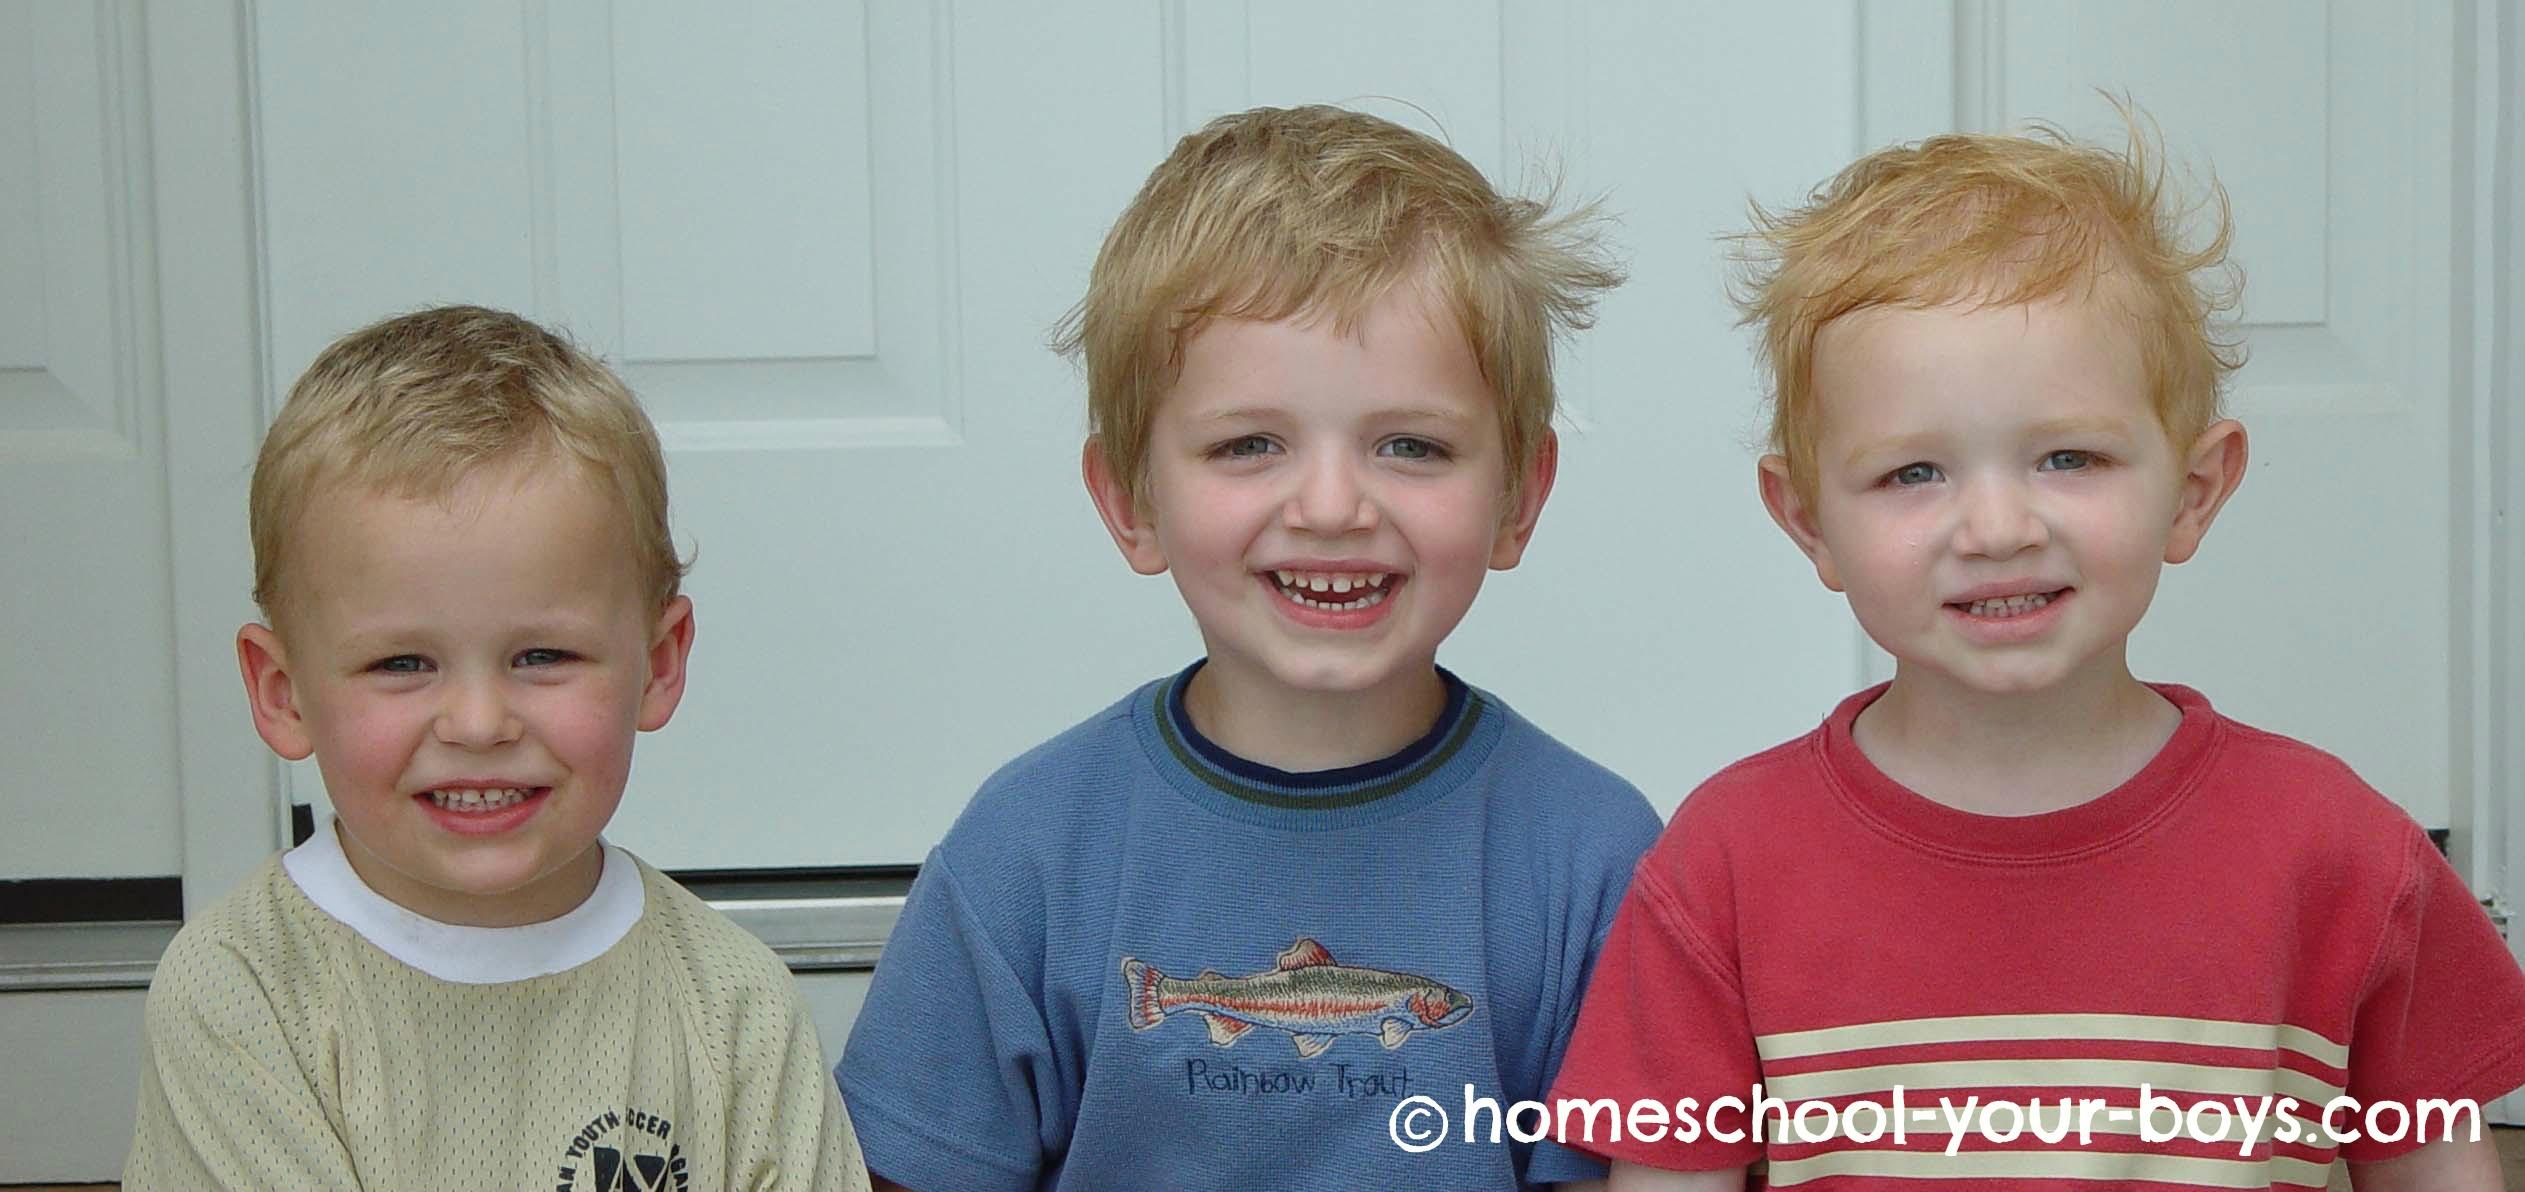 Should I Make My Own Homeschool Preschool Curriculum?